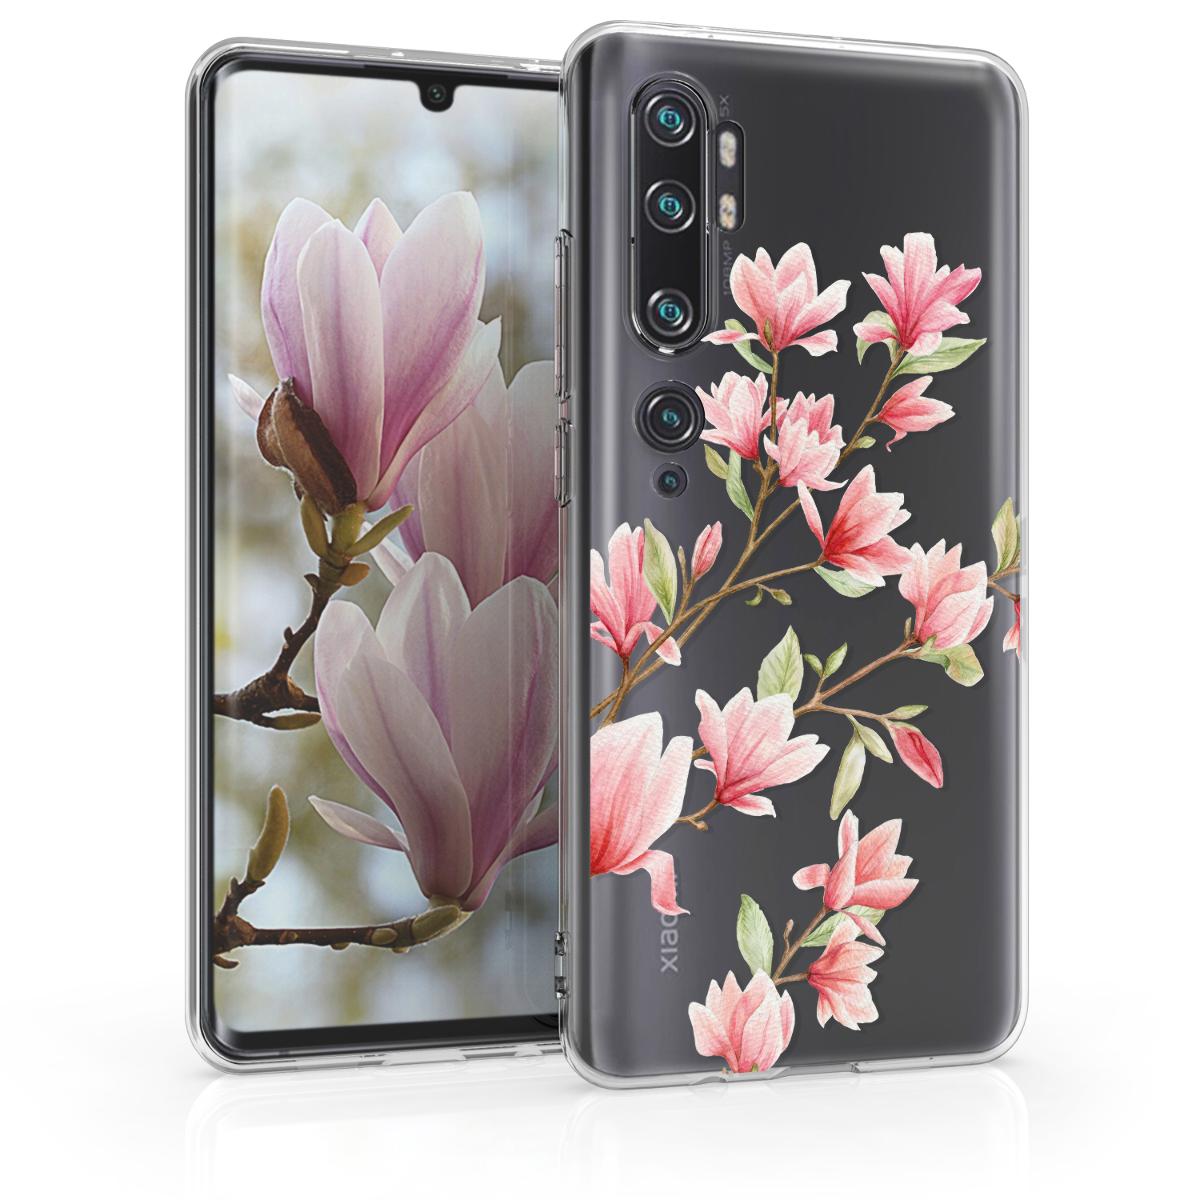 KW Θήκη Σιλικόνης Xiaomi Mi Note 10 / Note 10 Pro - Magnolias - Light Pink / White / Transparent (50954.02)